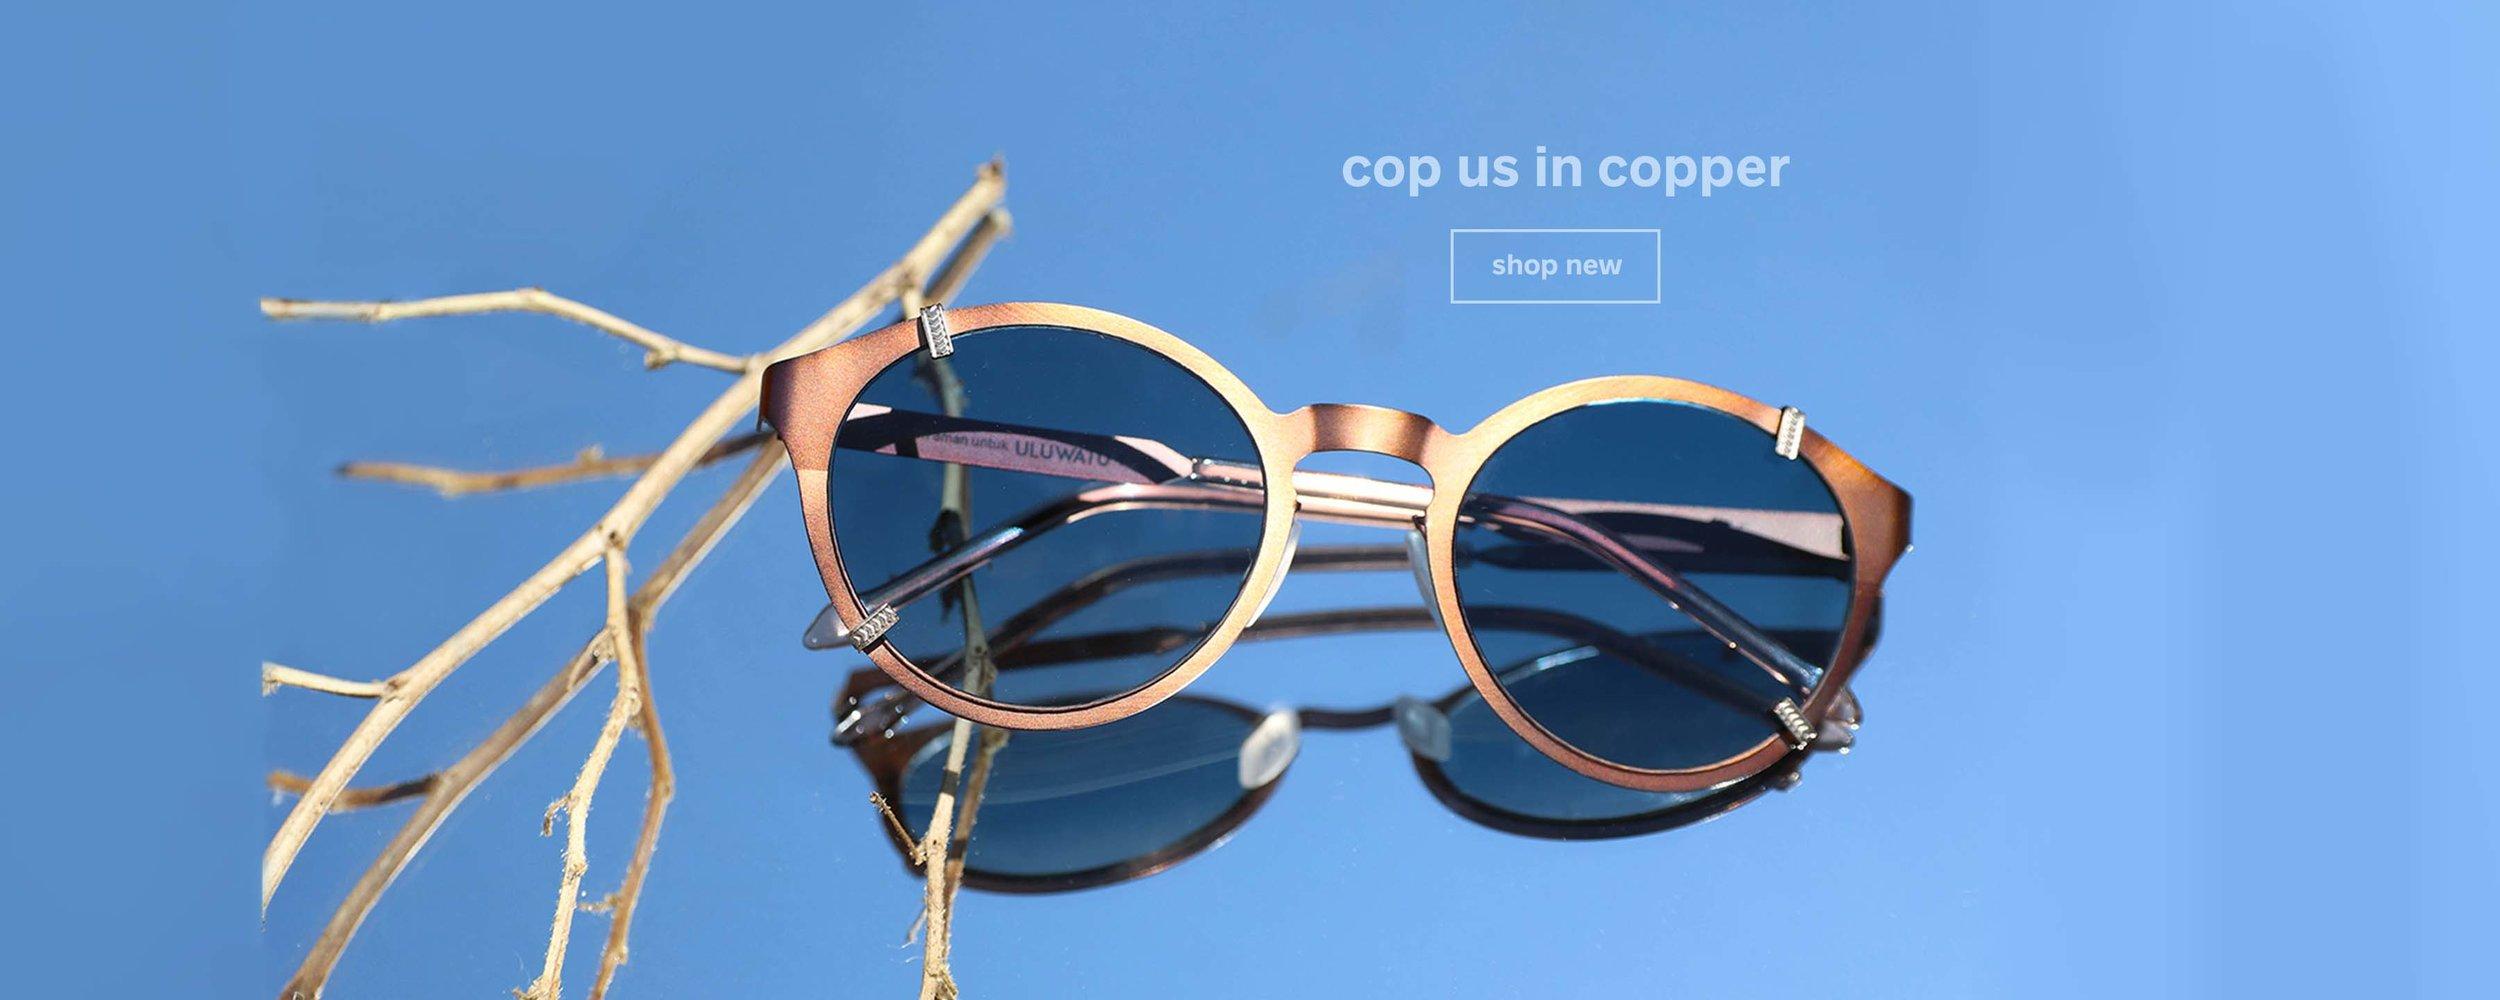 copper-min (1).jpg